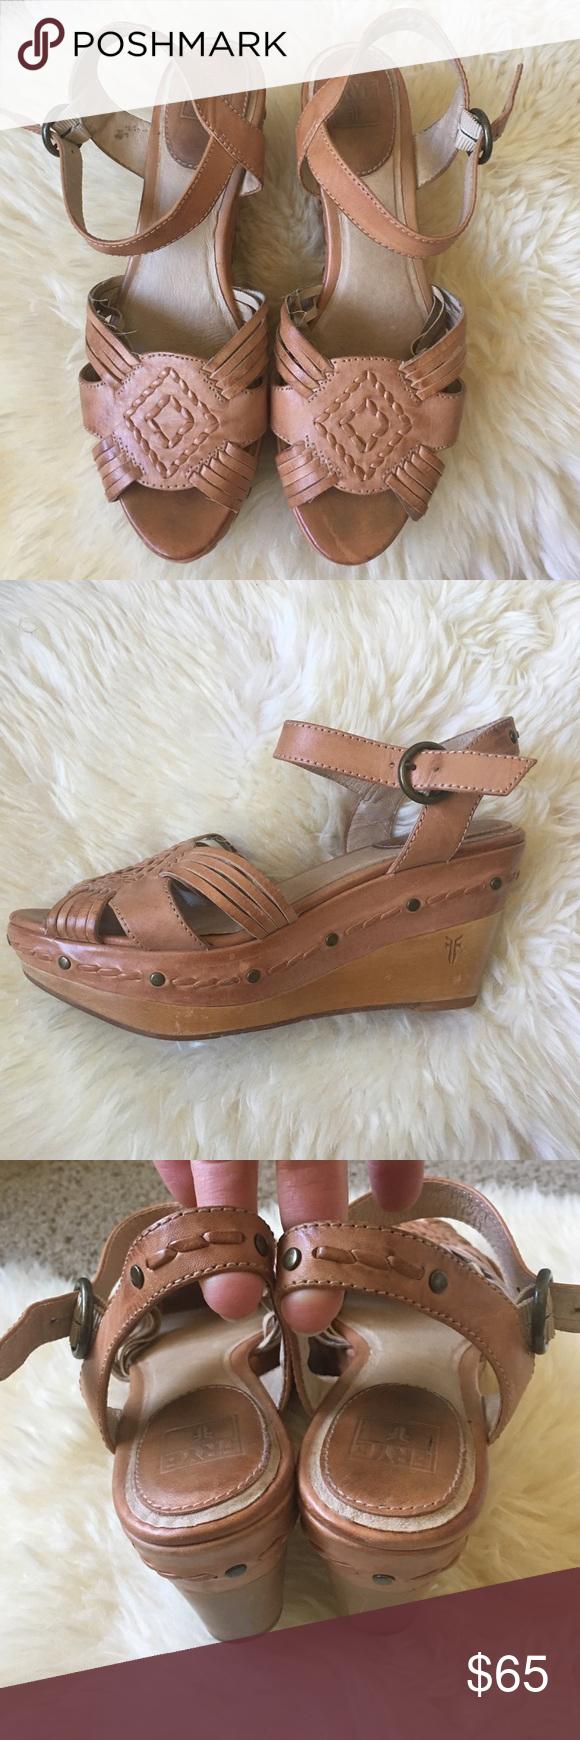 c58b2fc9550 Frye sandals - Carlie Huarache Frye wedge sandals in tan! Super cute leather